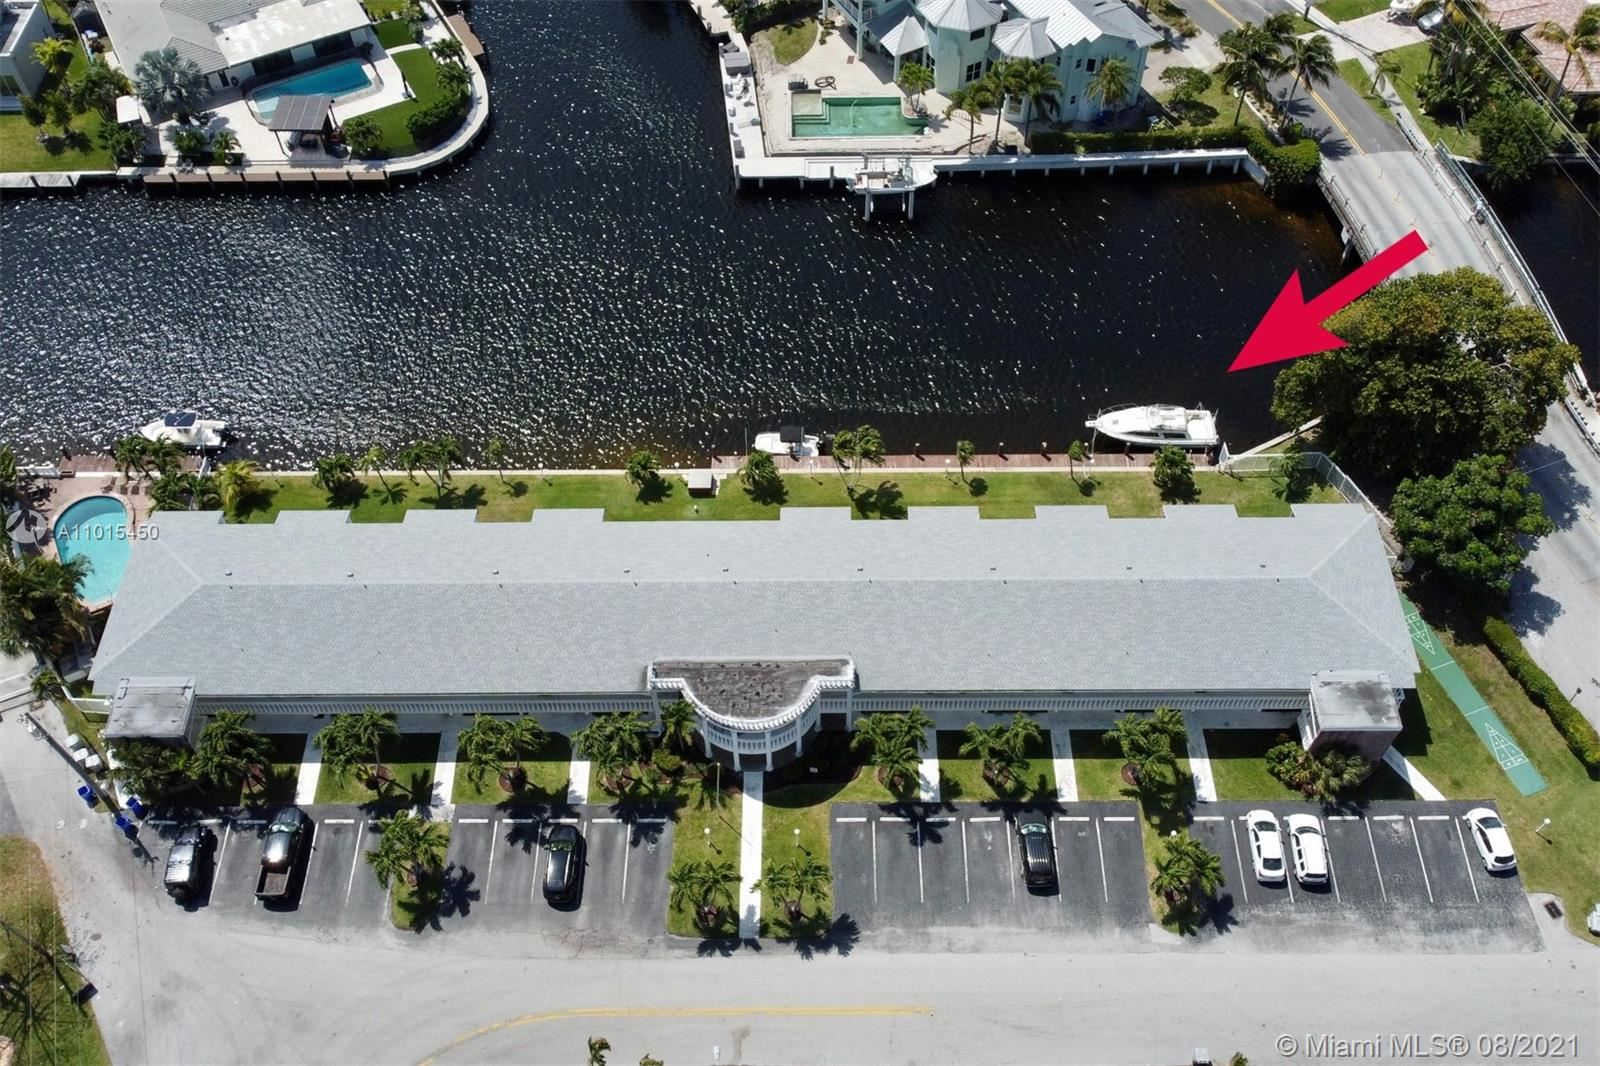 1100 Pine Dr #201, Pompano Beach, FL 33060 - #: A11015450